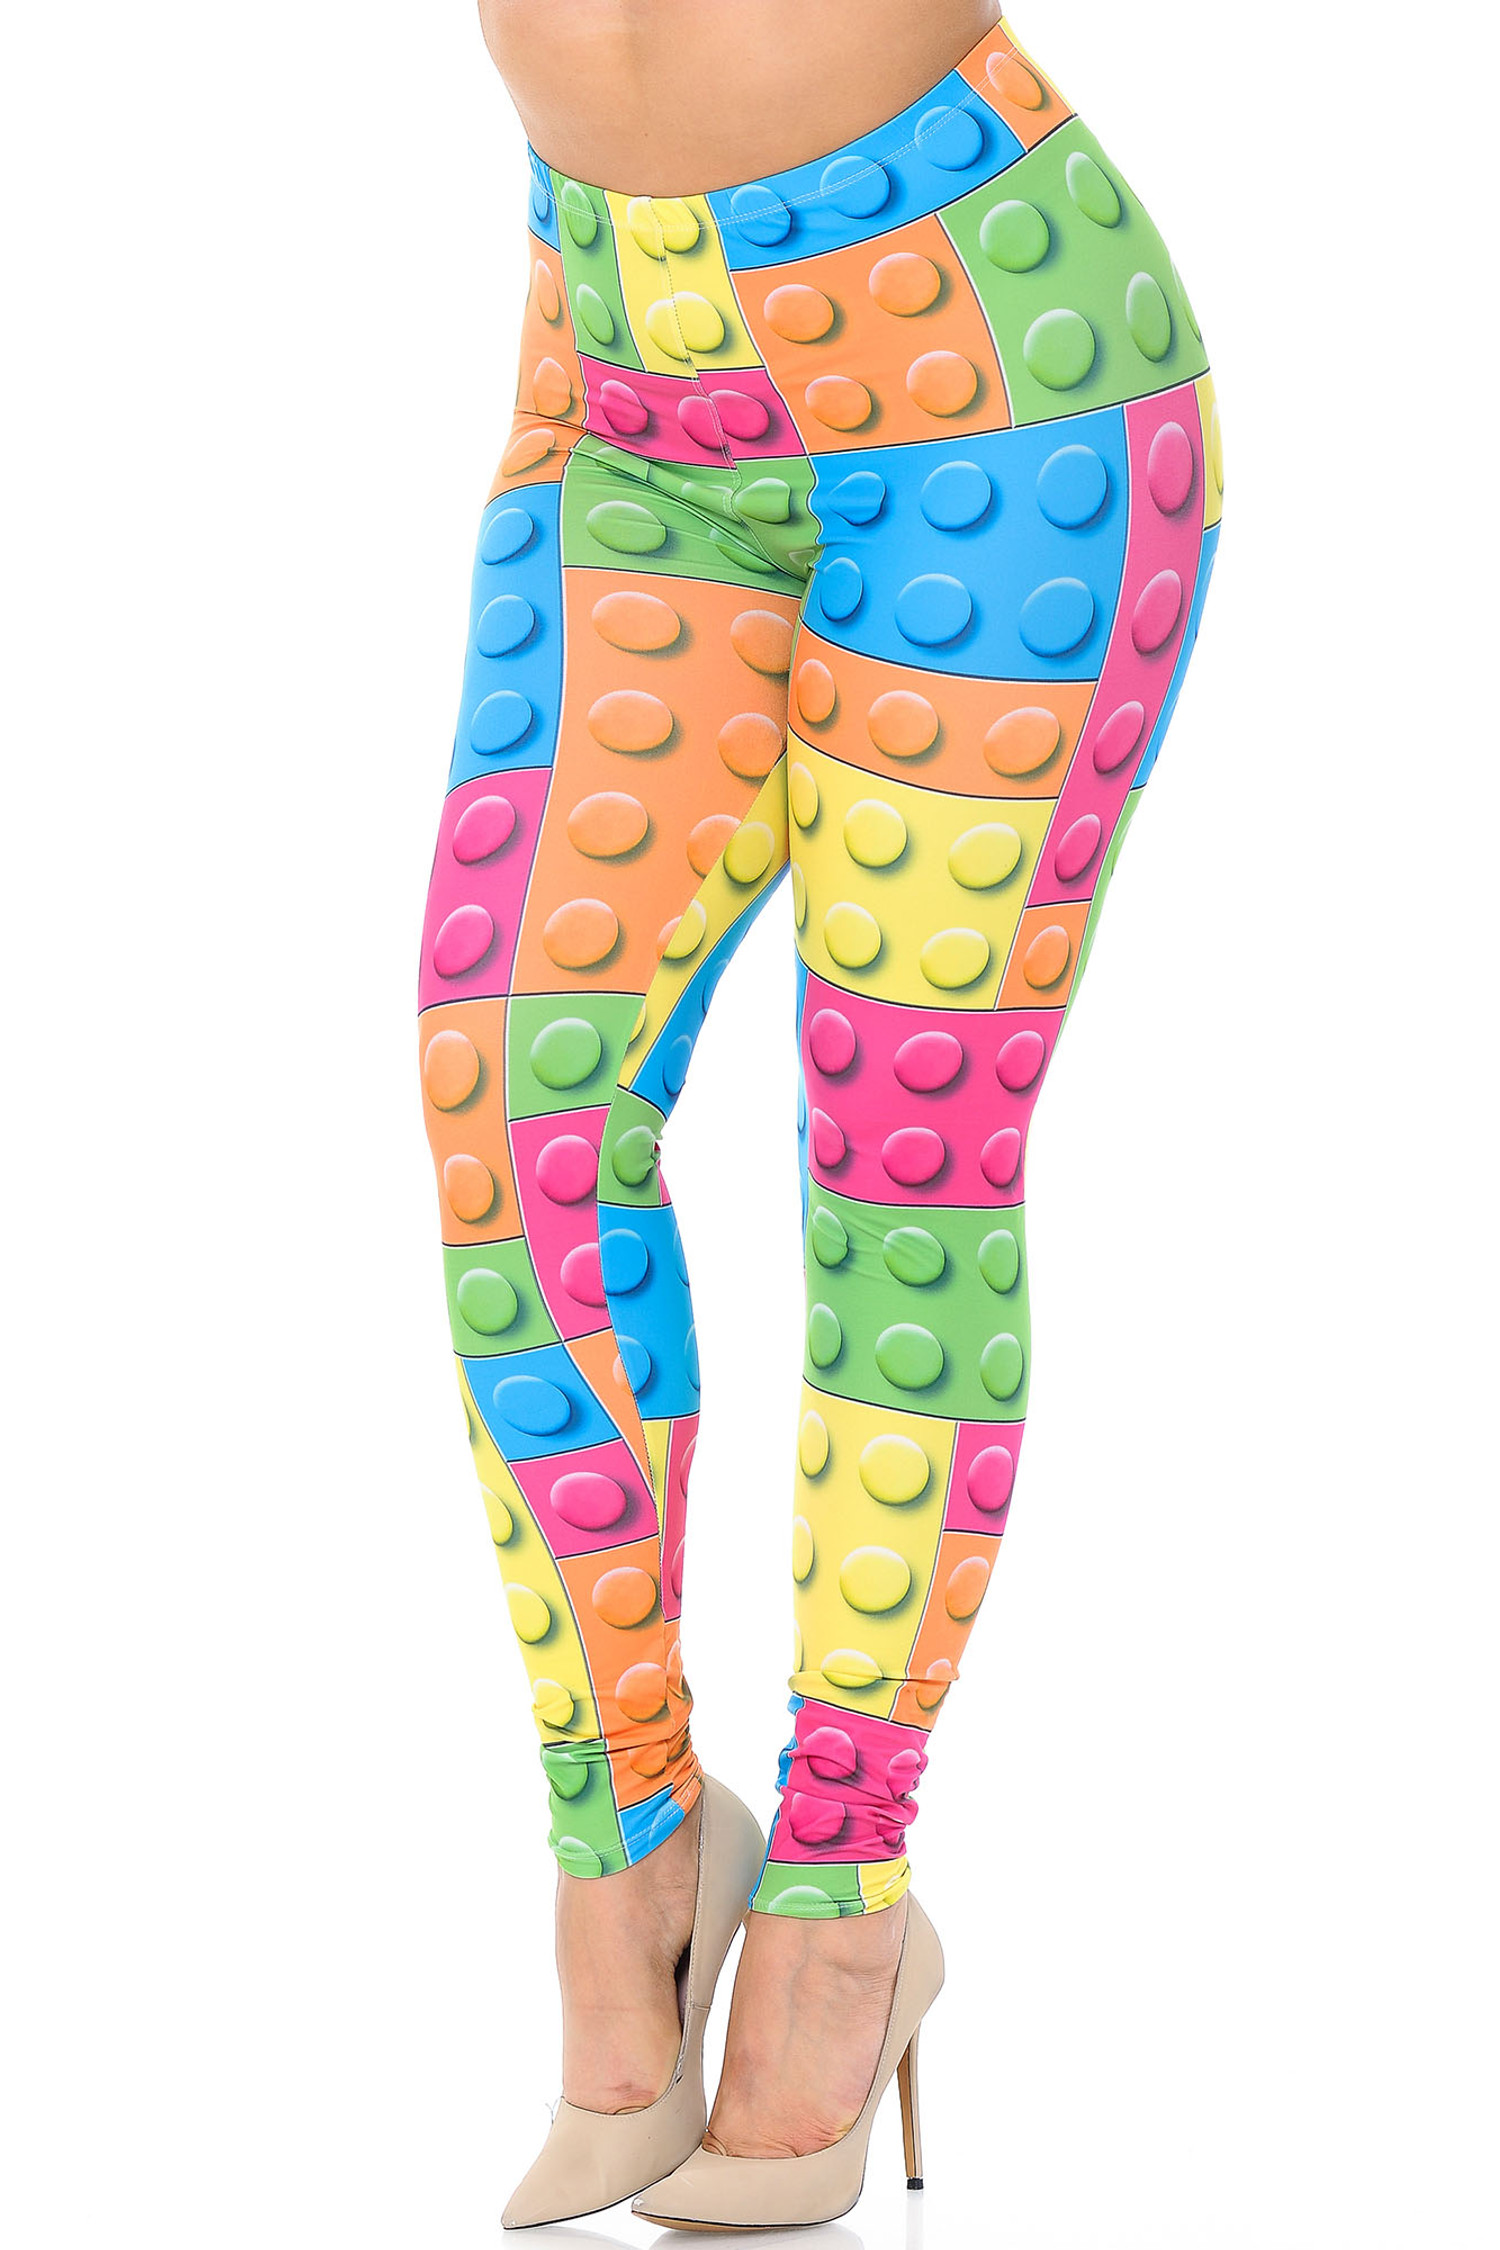 Creamy Soft Lego Plus Size Leggings - USA Fashion™